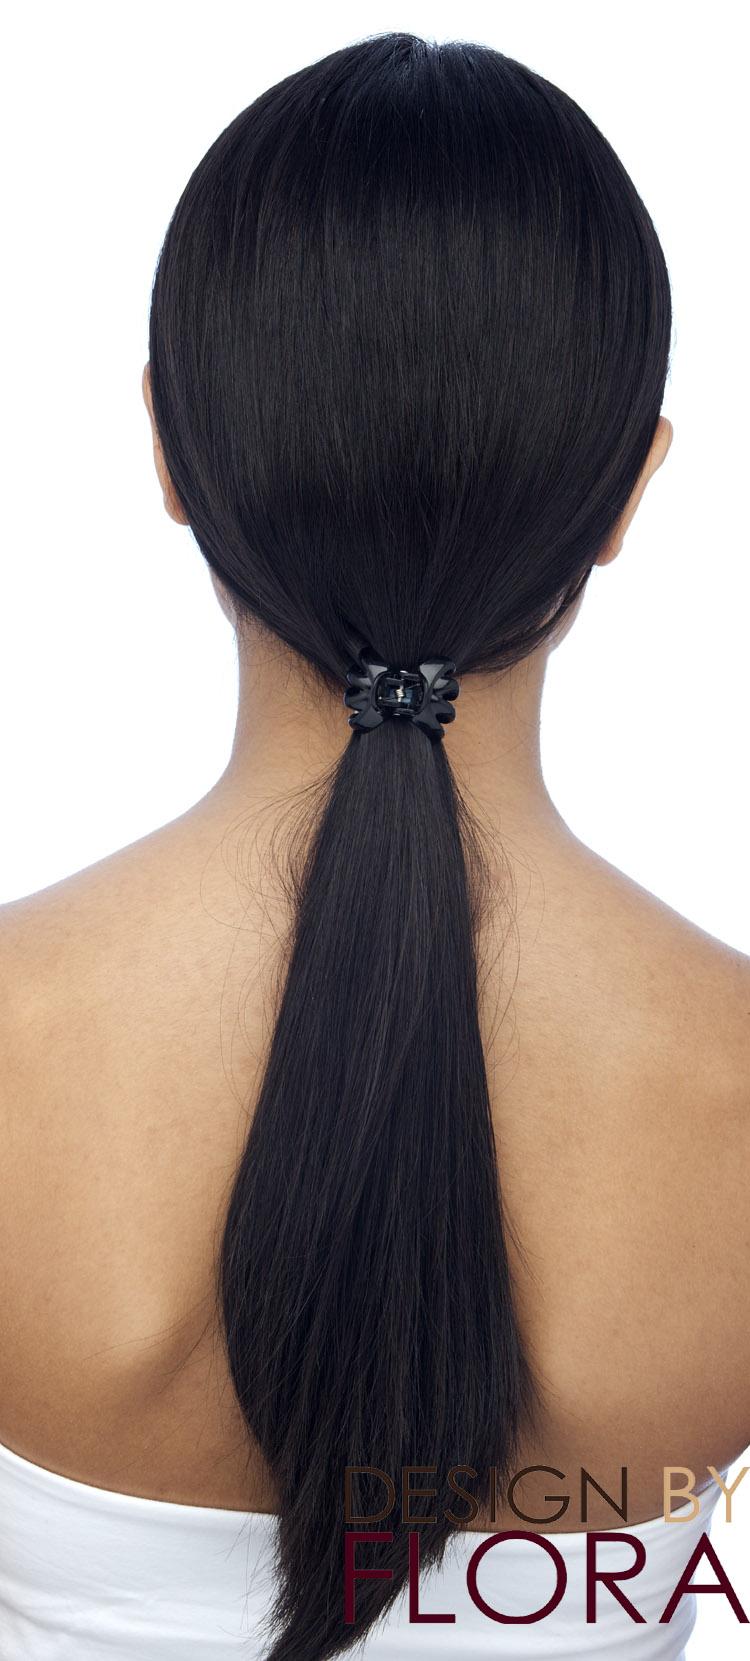 Lisa-01-68-Human-Hair-Wig